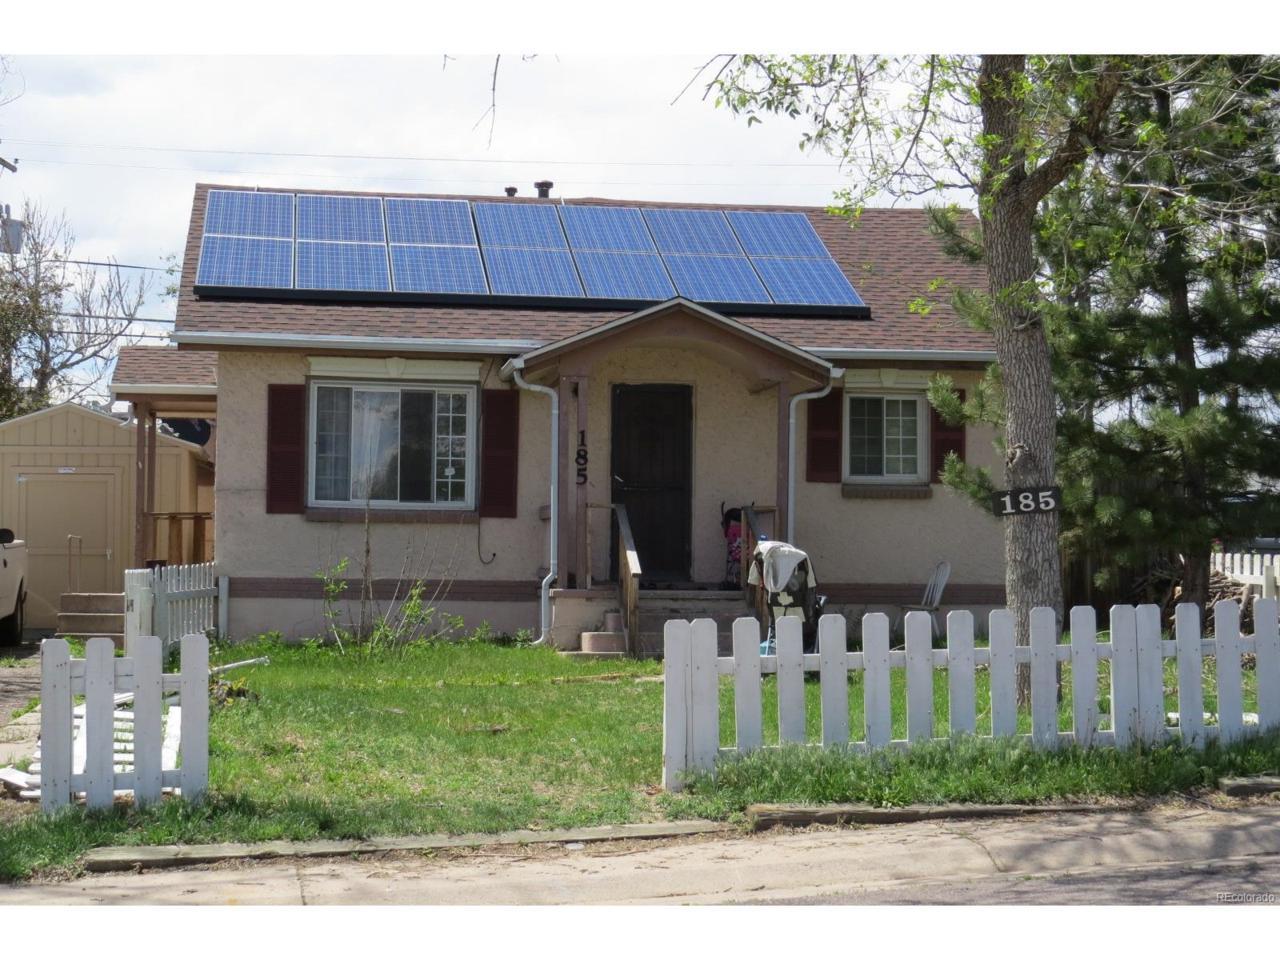 185 S Eliot Street, Denver, CO 80219 (MLS #1556855) :: 8z Real Estate